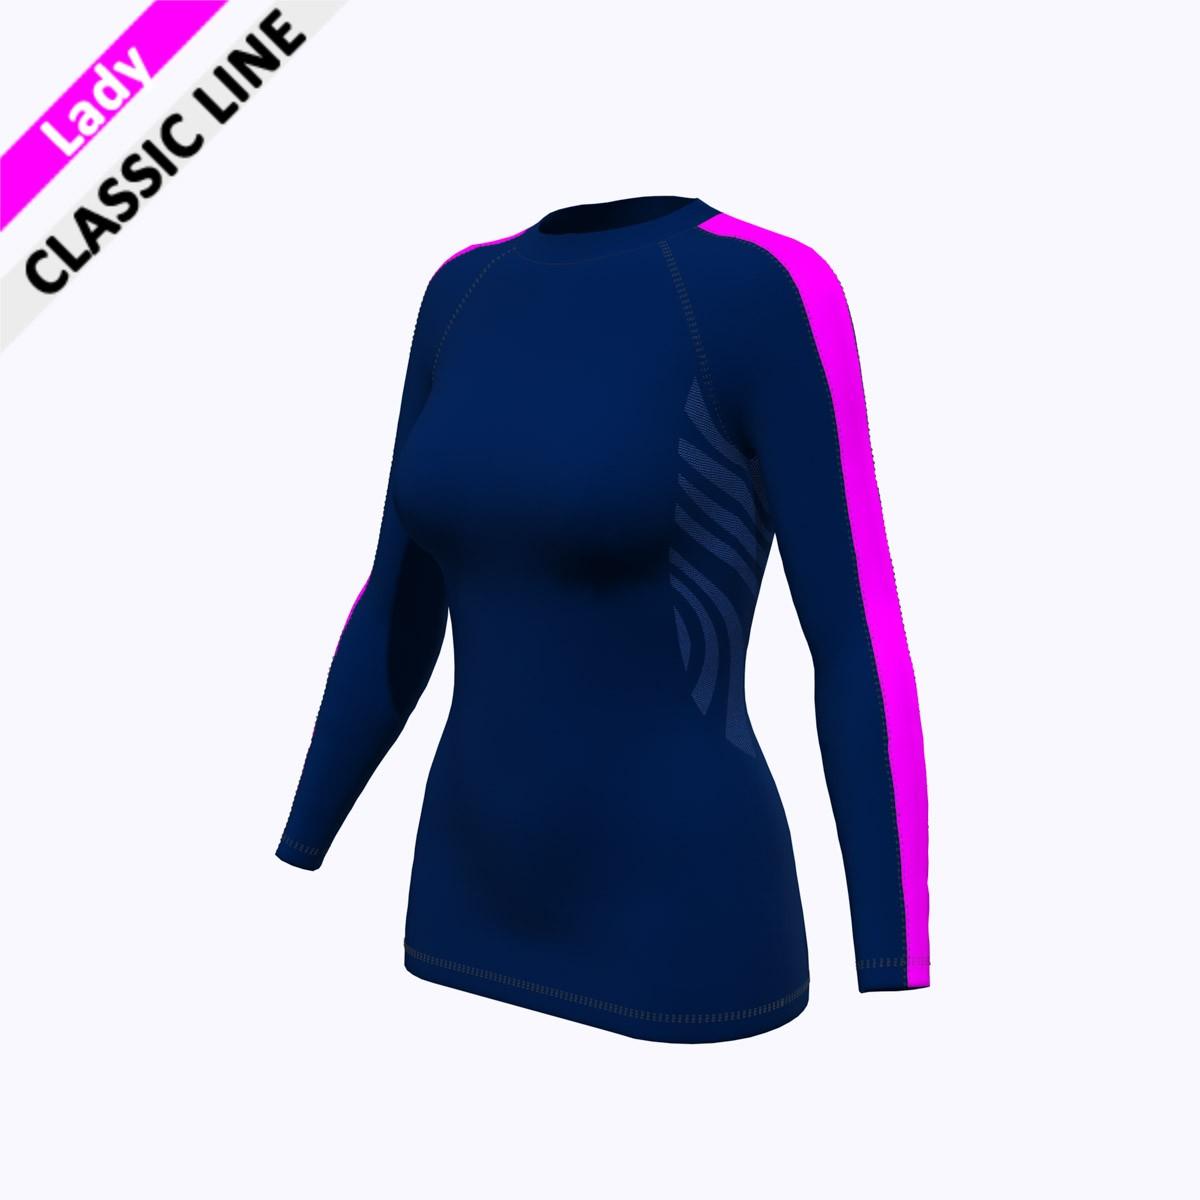 2skin - Longsleeve marine/pink F (Body - marine / Armstreifen - pink)